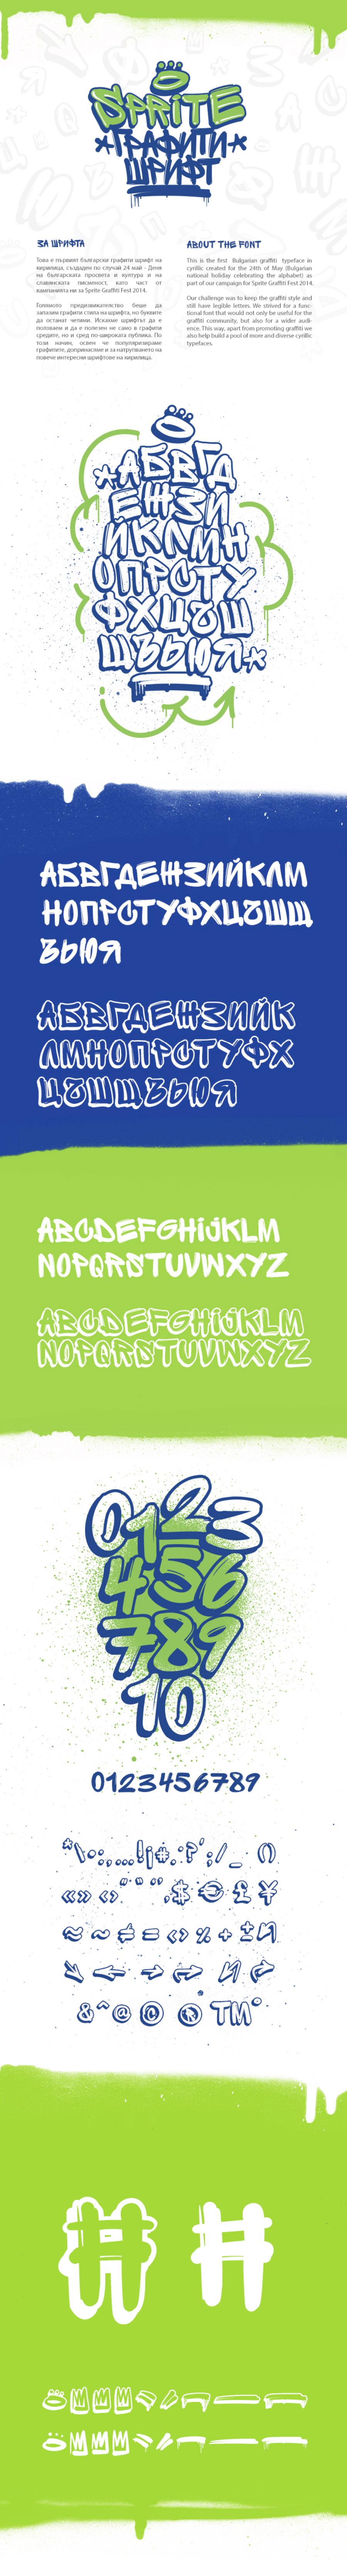 Sprite Graffiti Font - Fontfabric